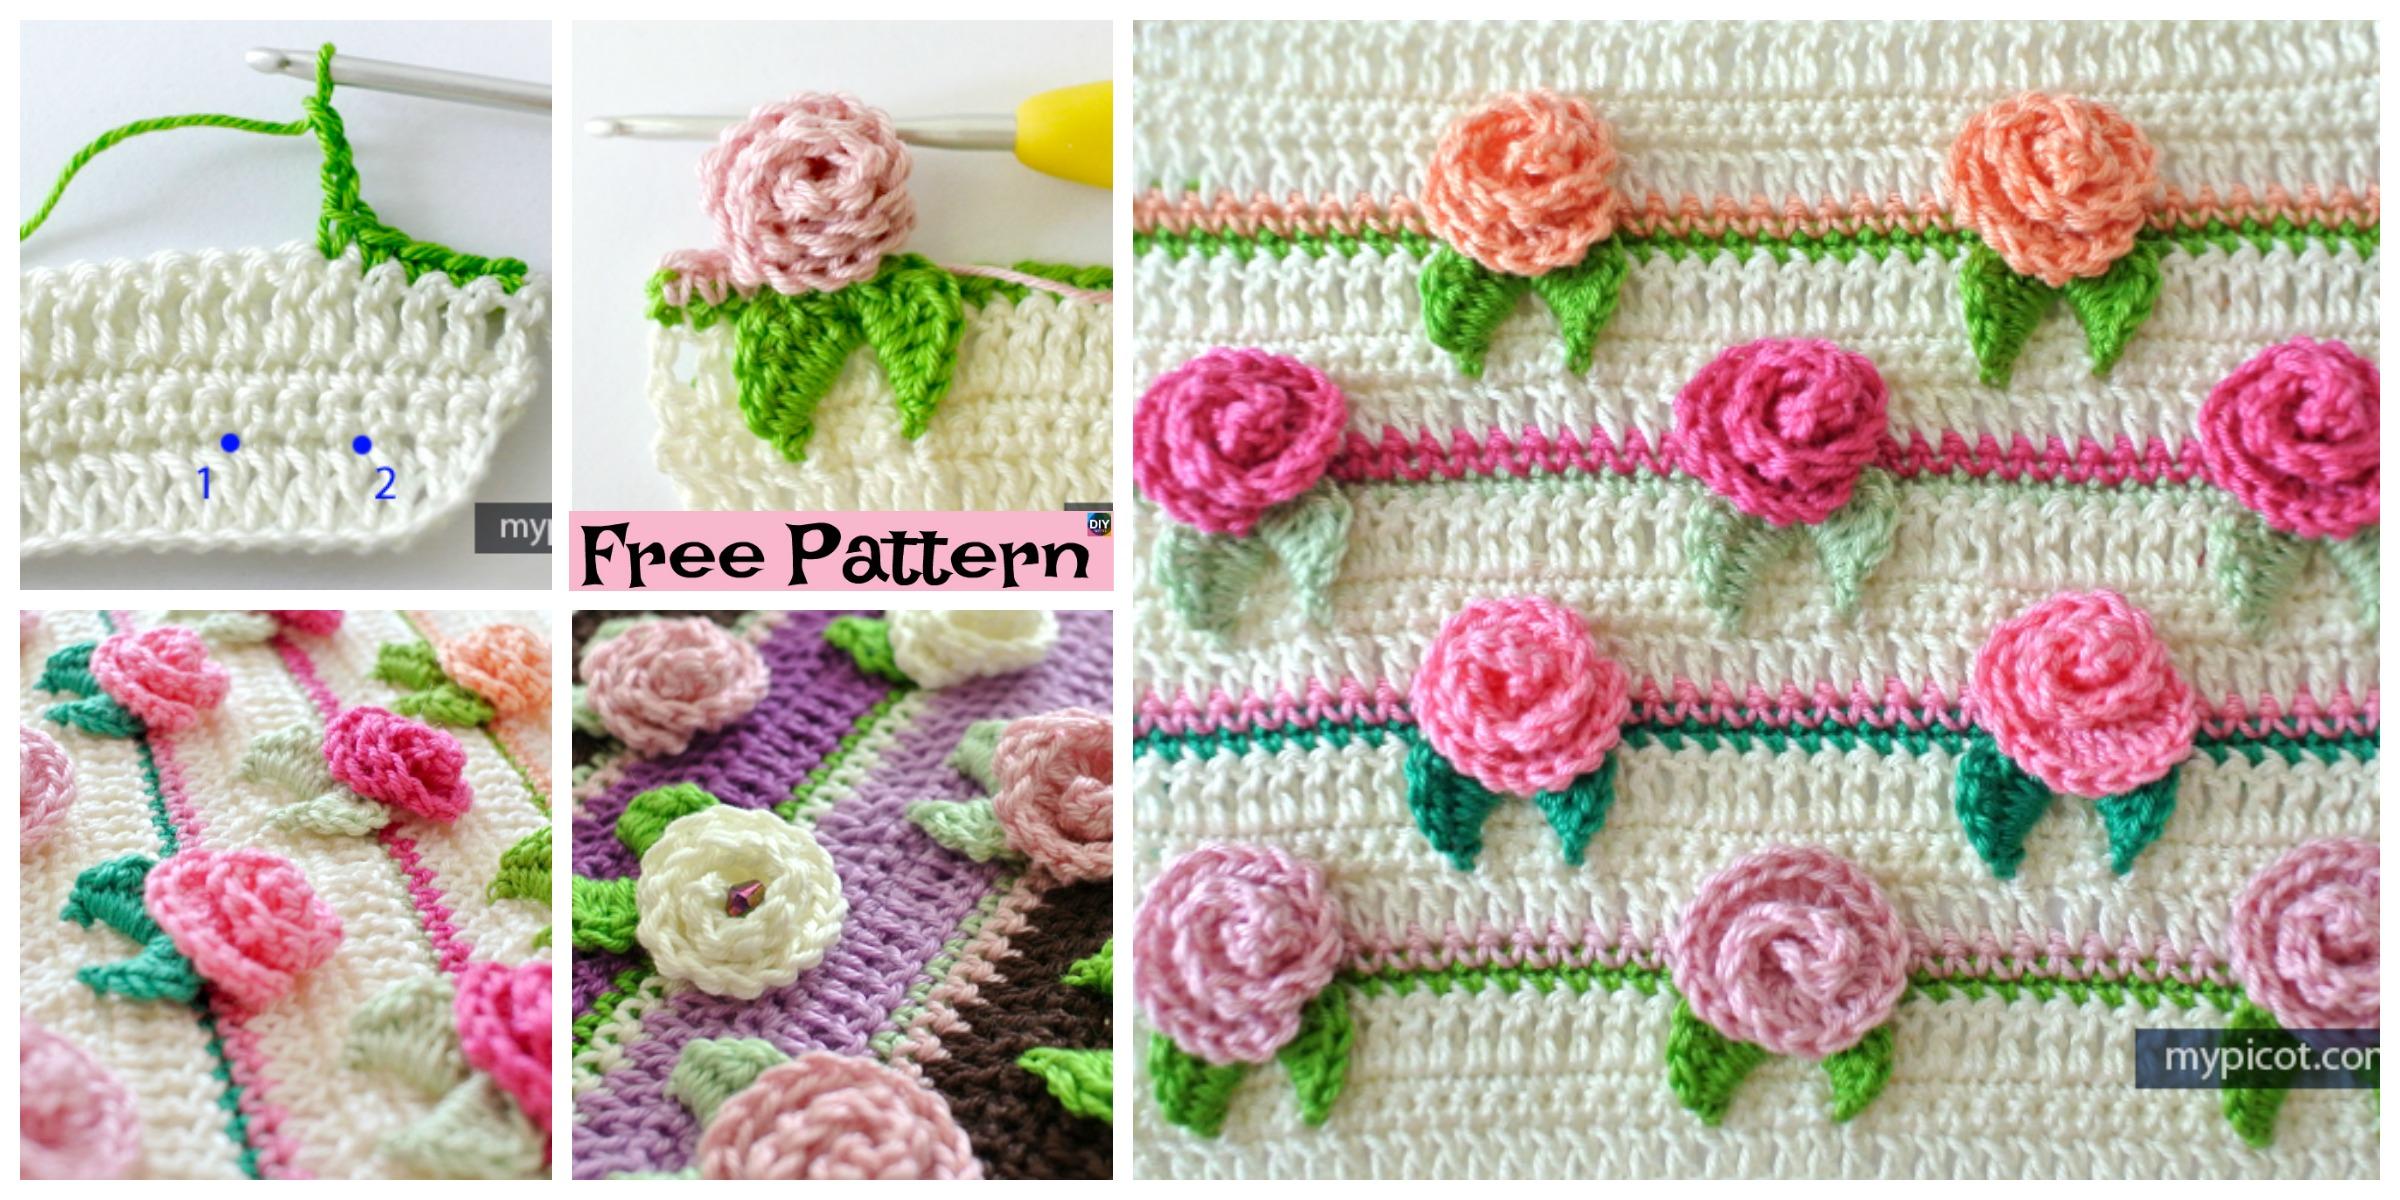 diy4ever-Pretty Crochet Rosebud Stitch - Free Pattern